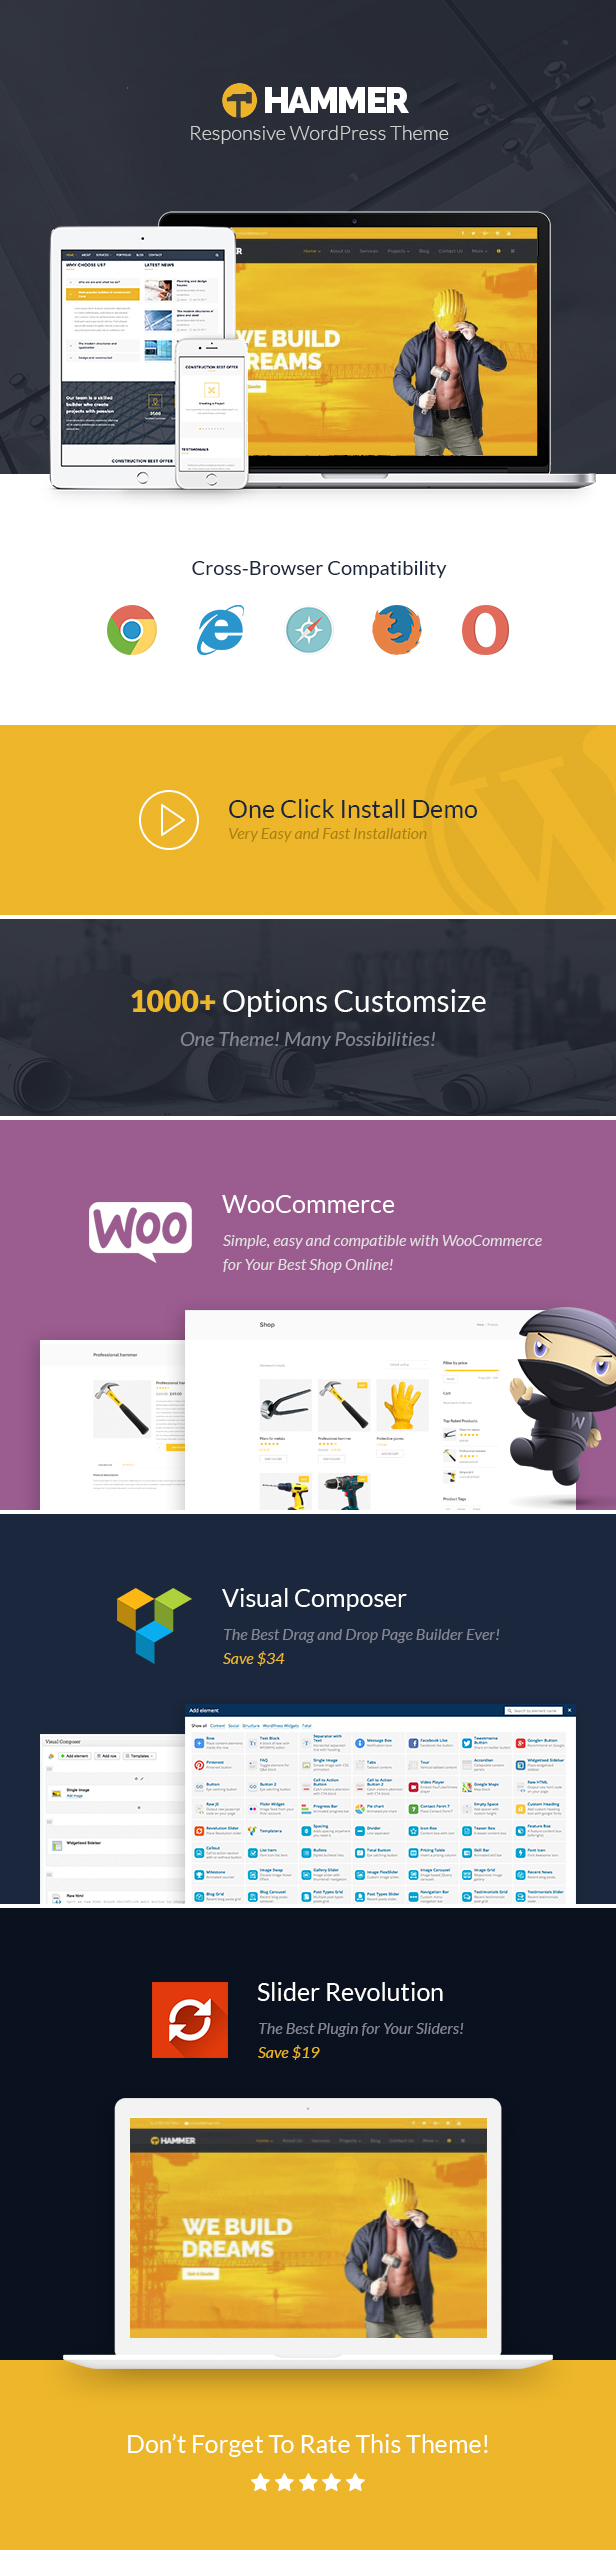 Hammer - Multi-Trade, Construction Business WordPress Theme - 12